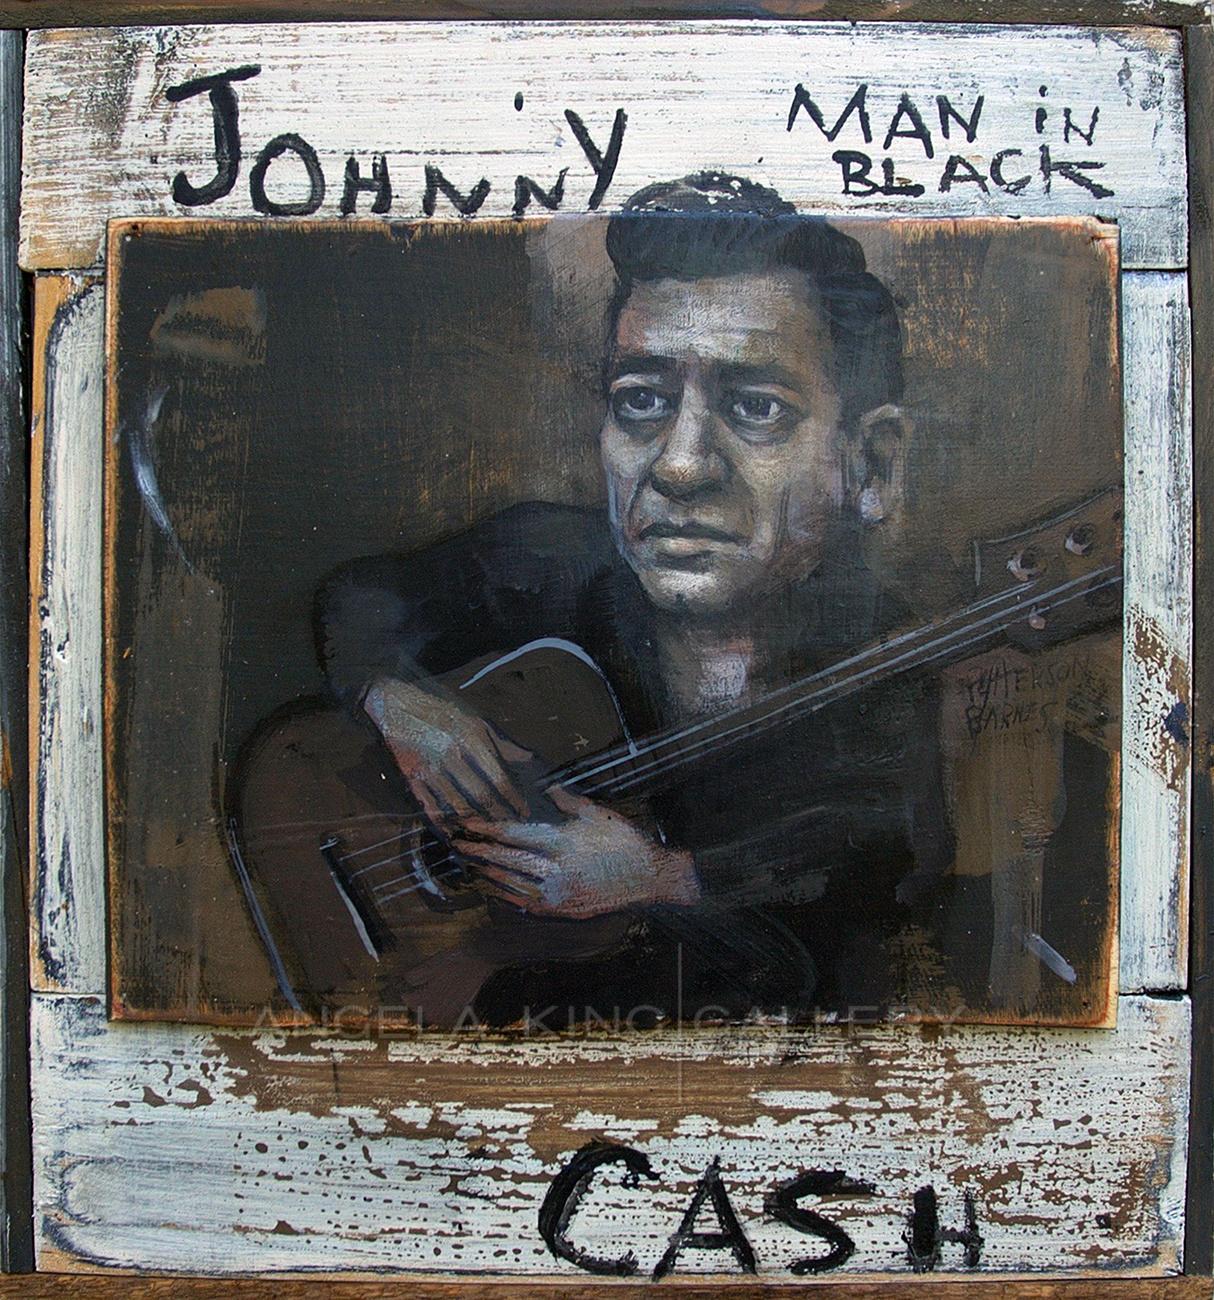 Johnny Man in Black Cash